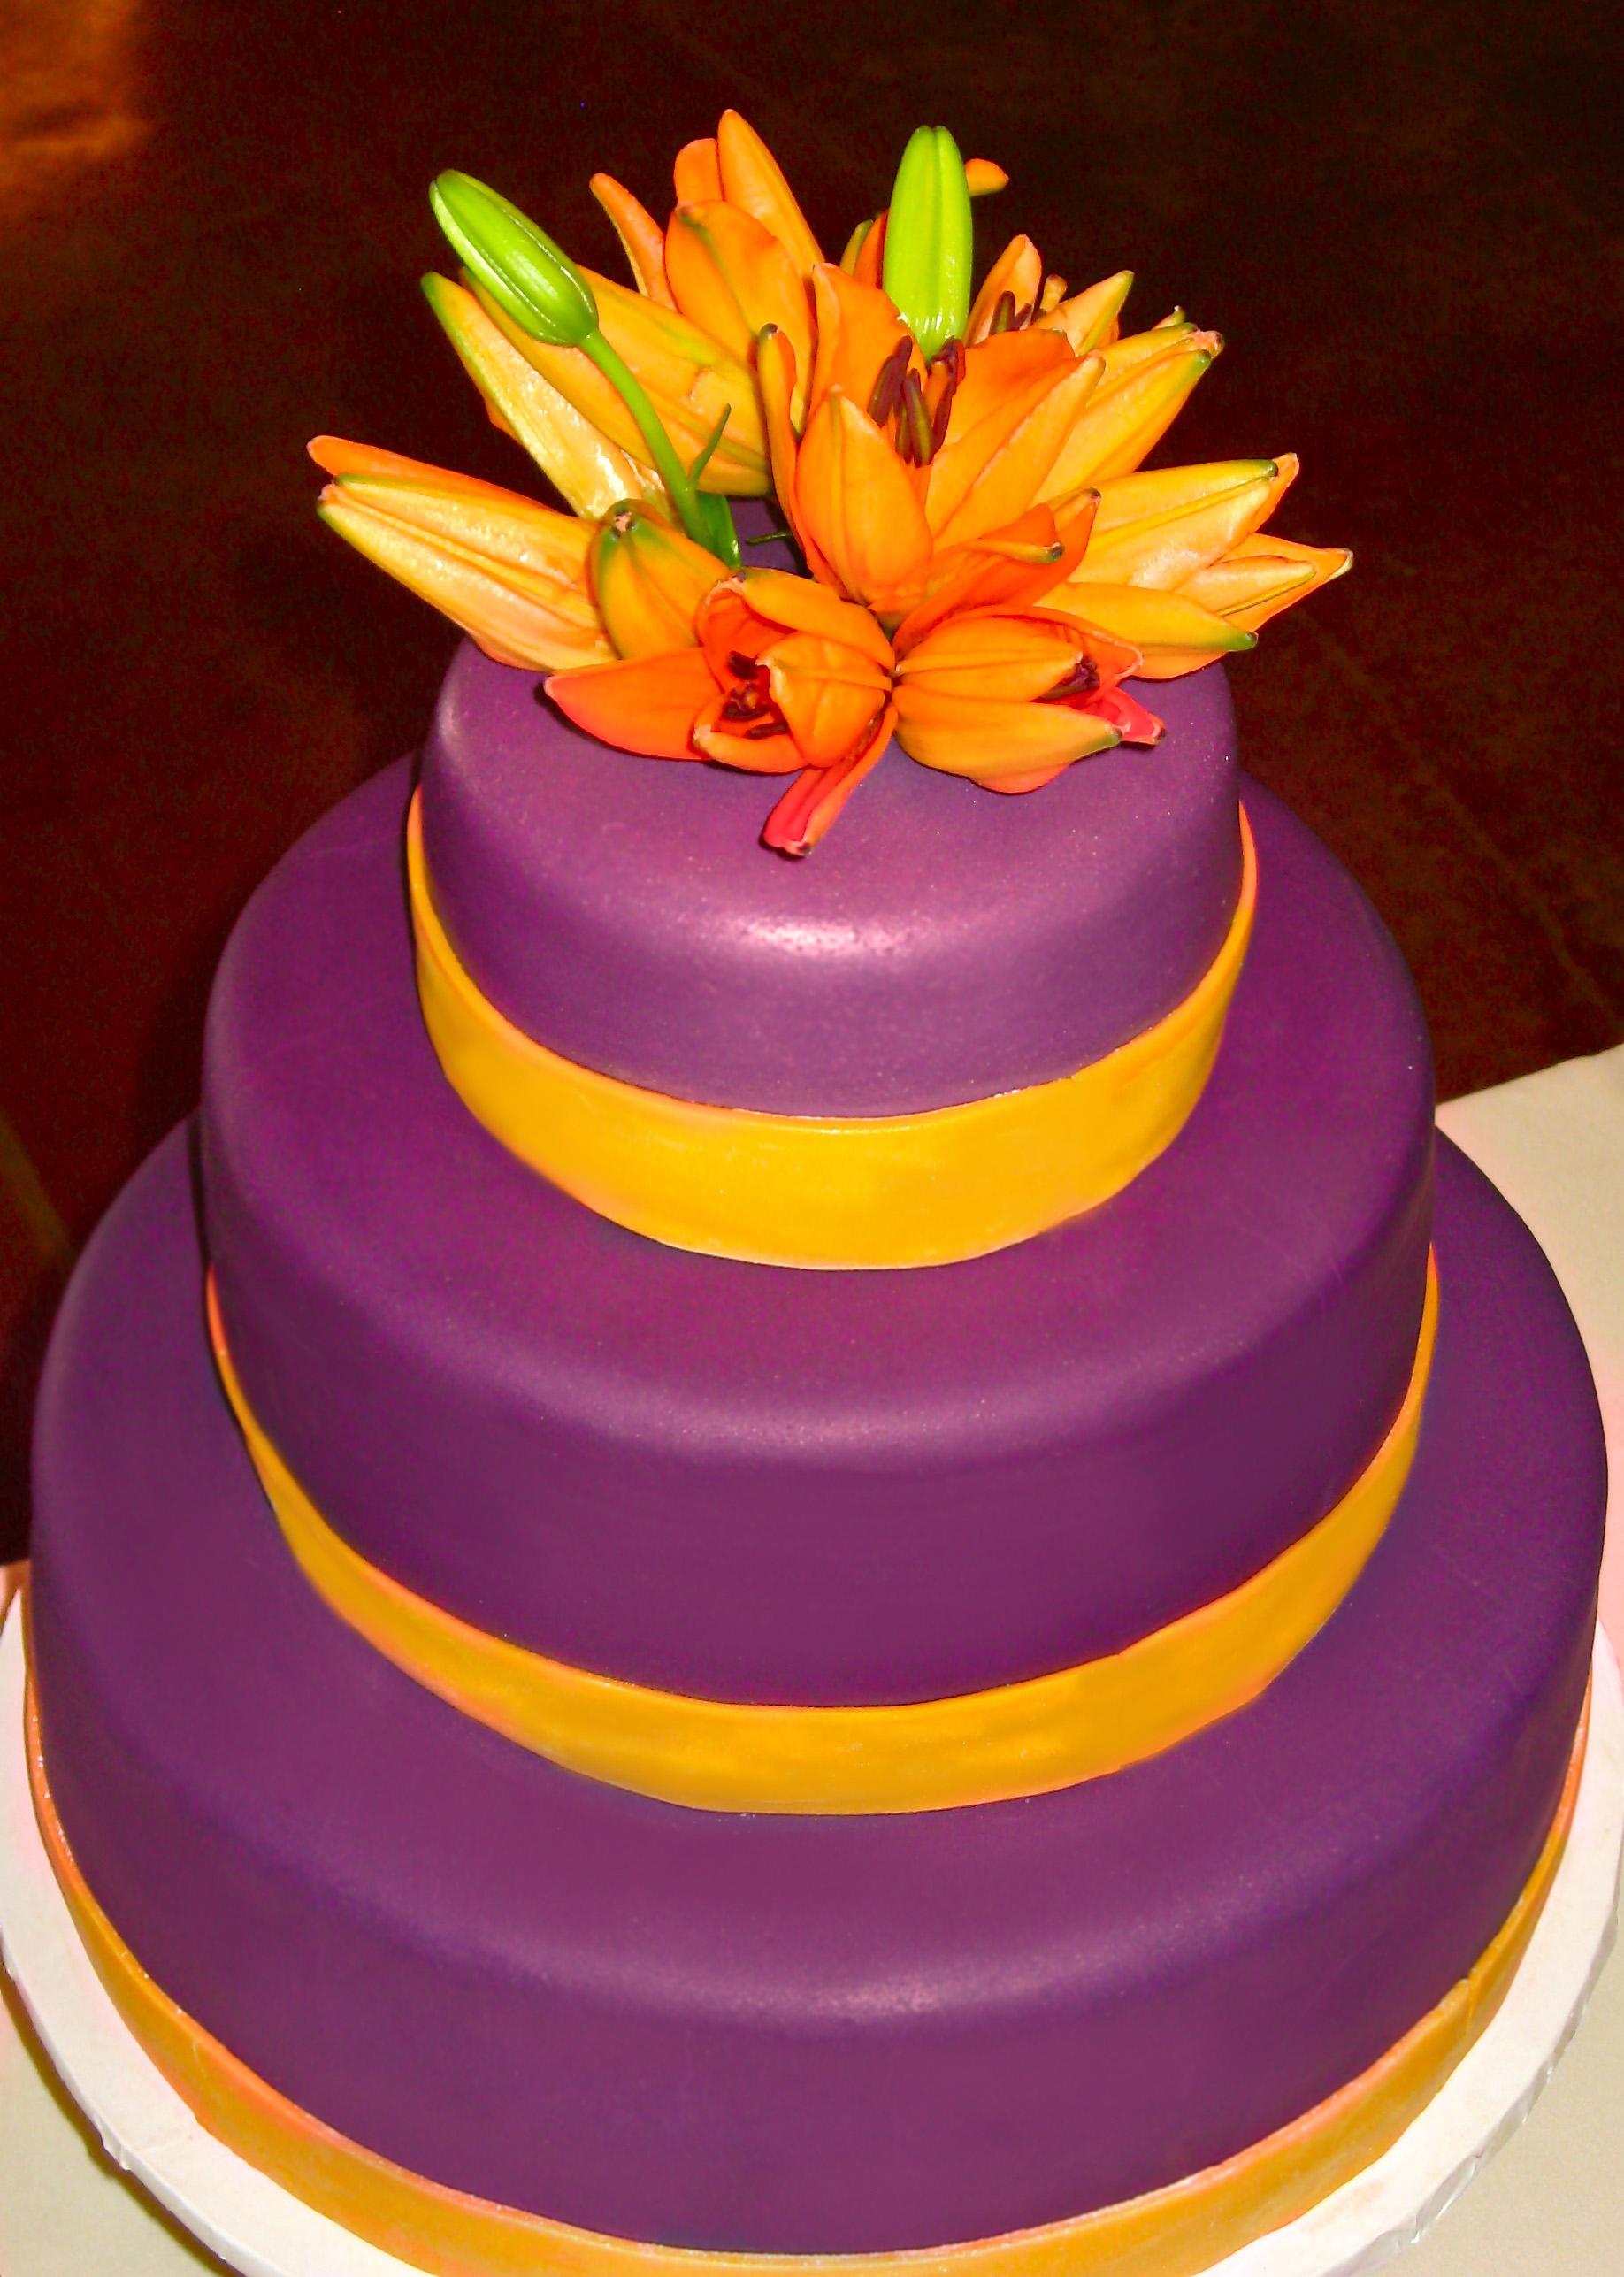 burgundy and citrus wedding cake with fresh tiger lillies | Artisan ...